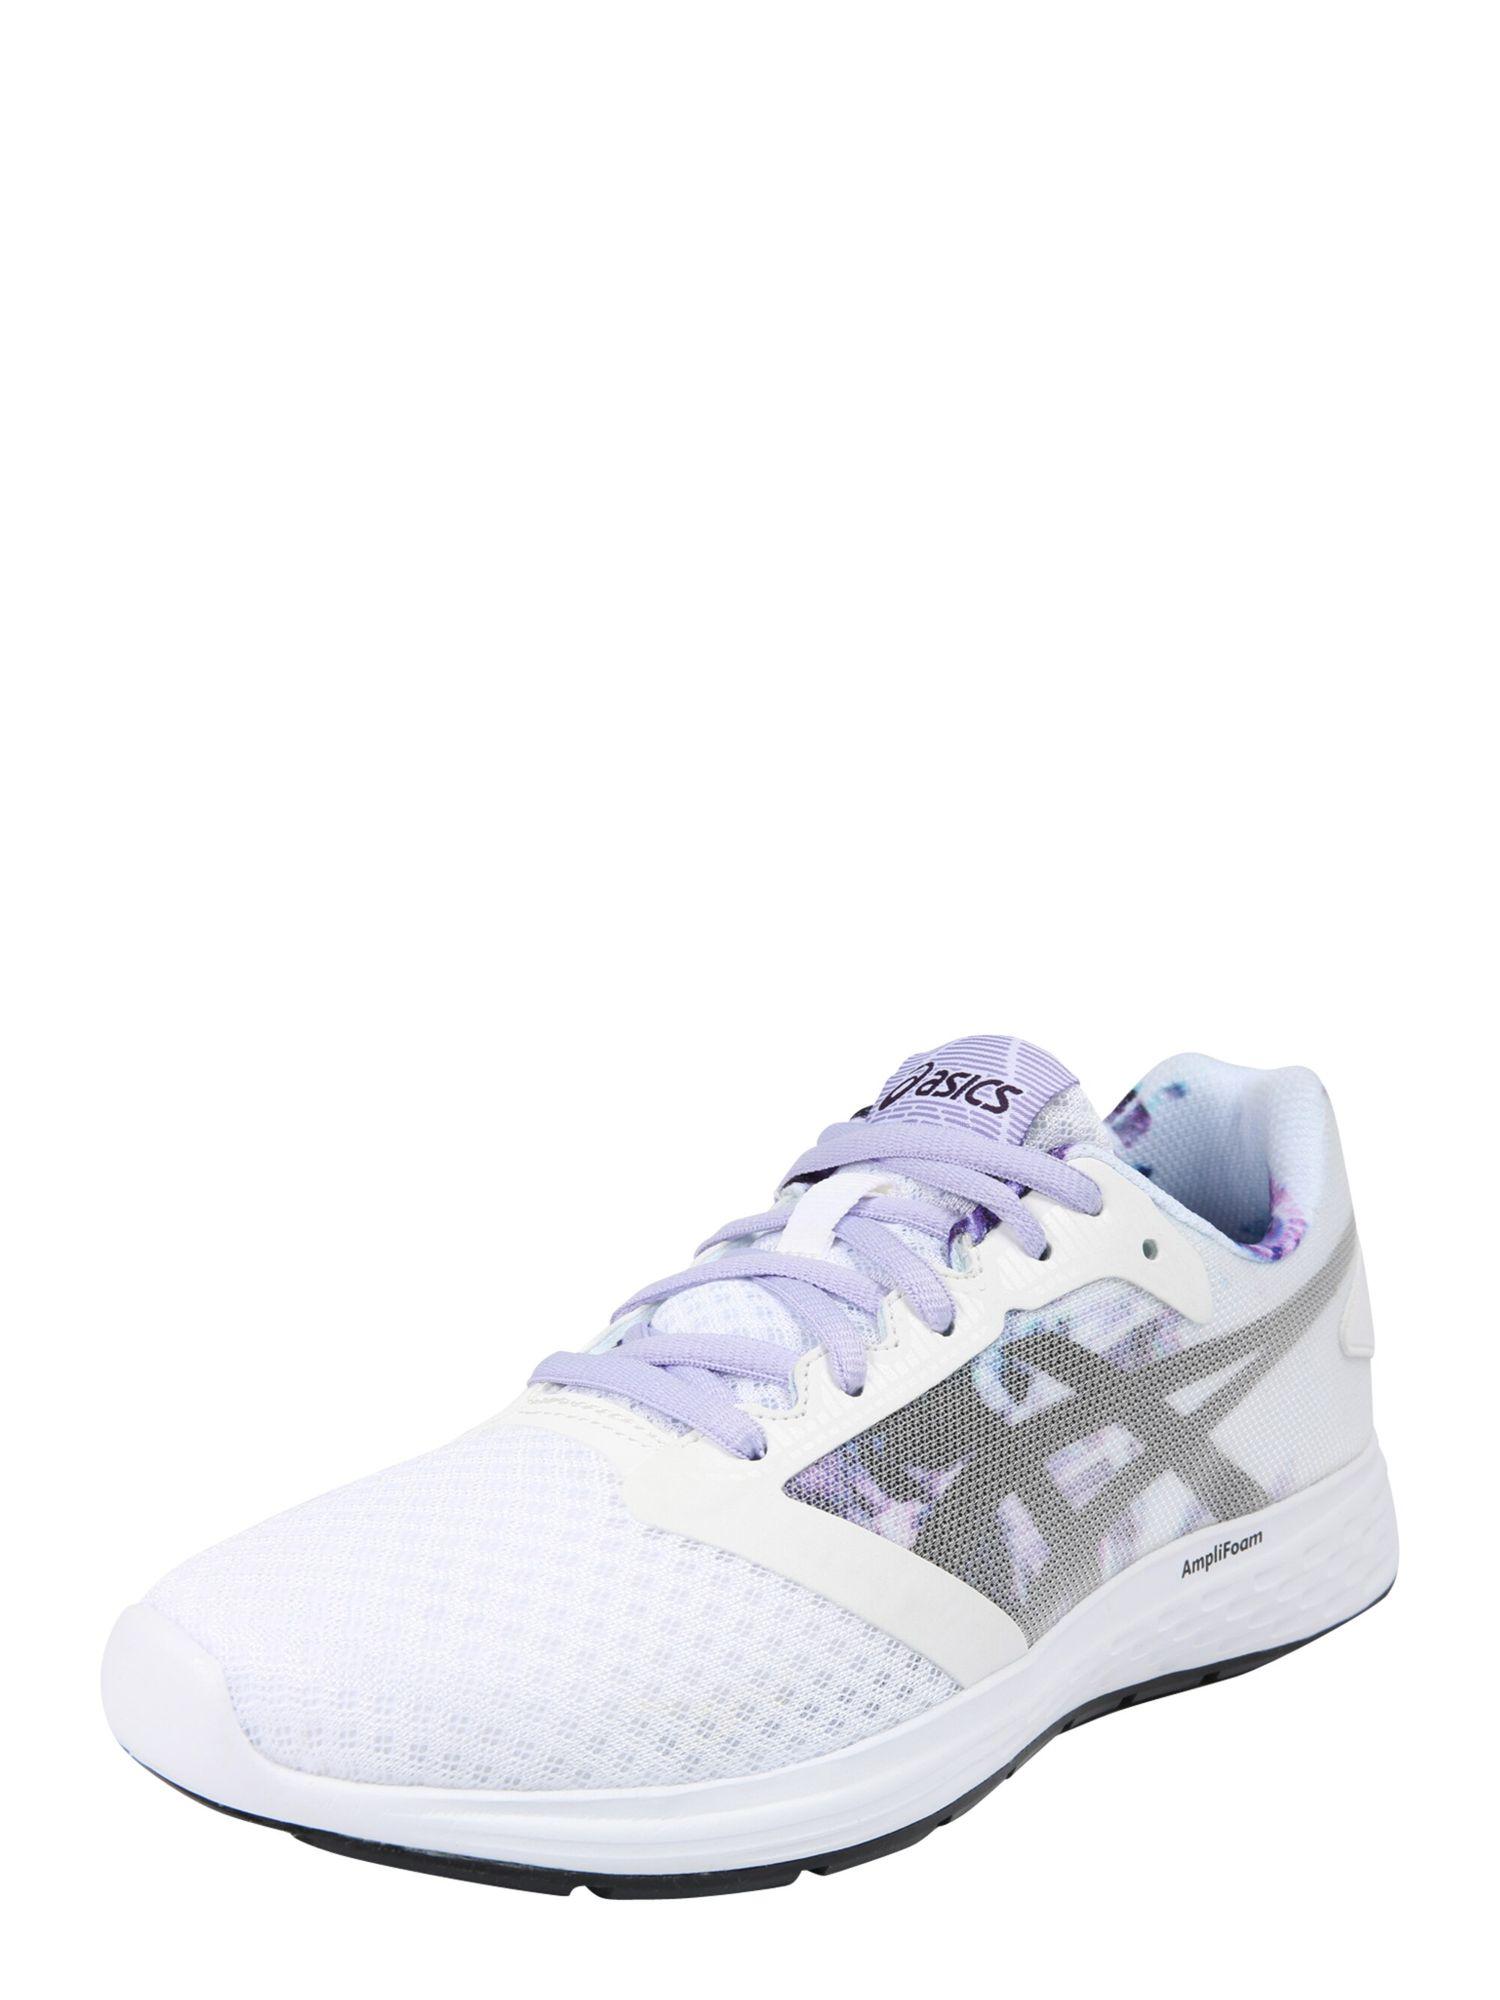 Sport-Schuhe ´Patriot 10 SP´